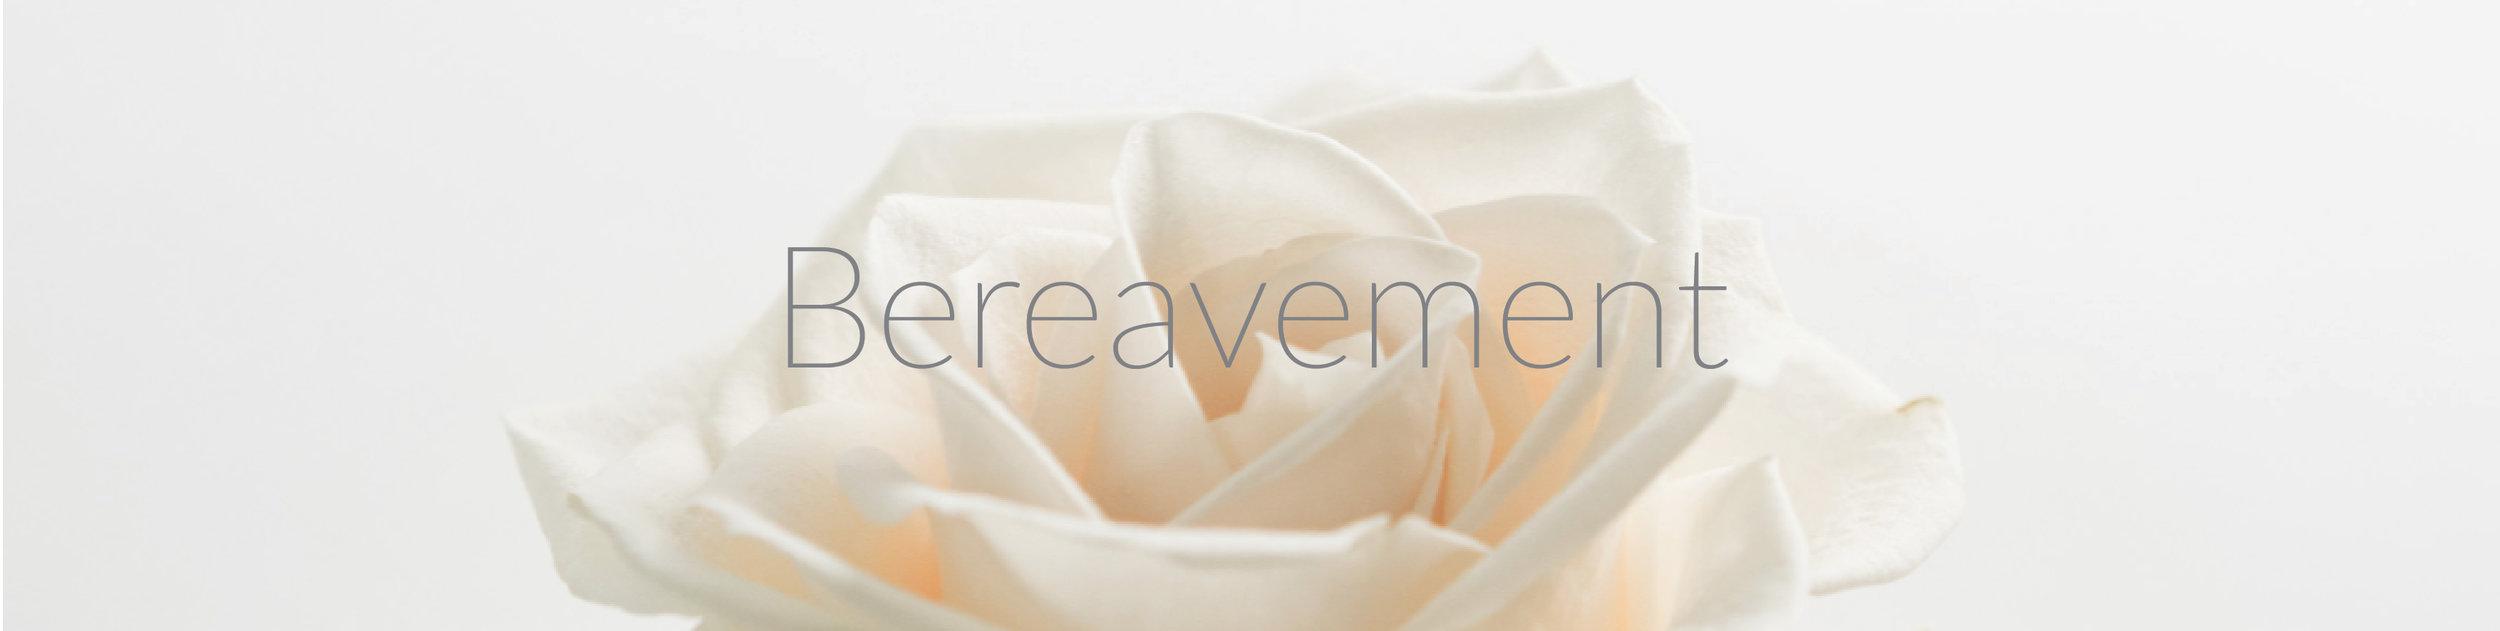 Bereavement.jpg